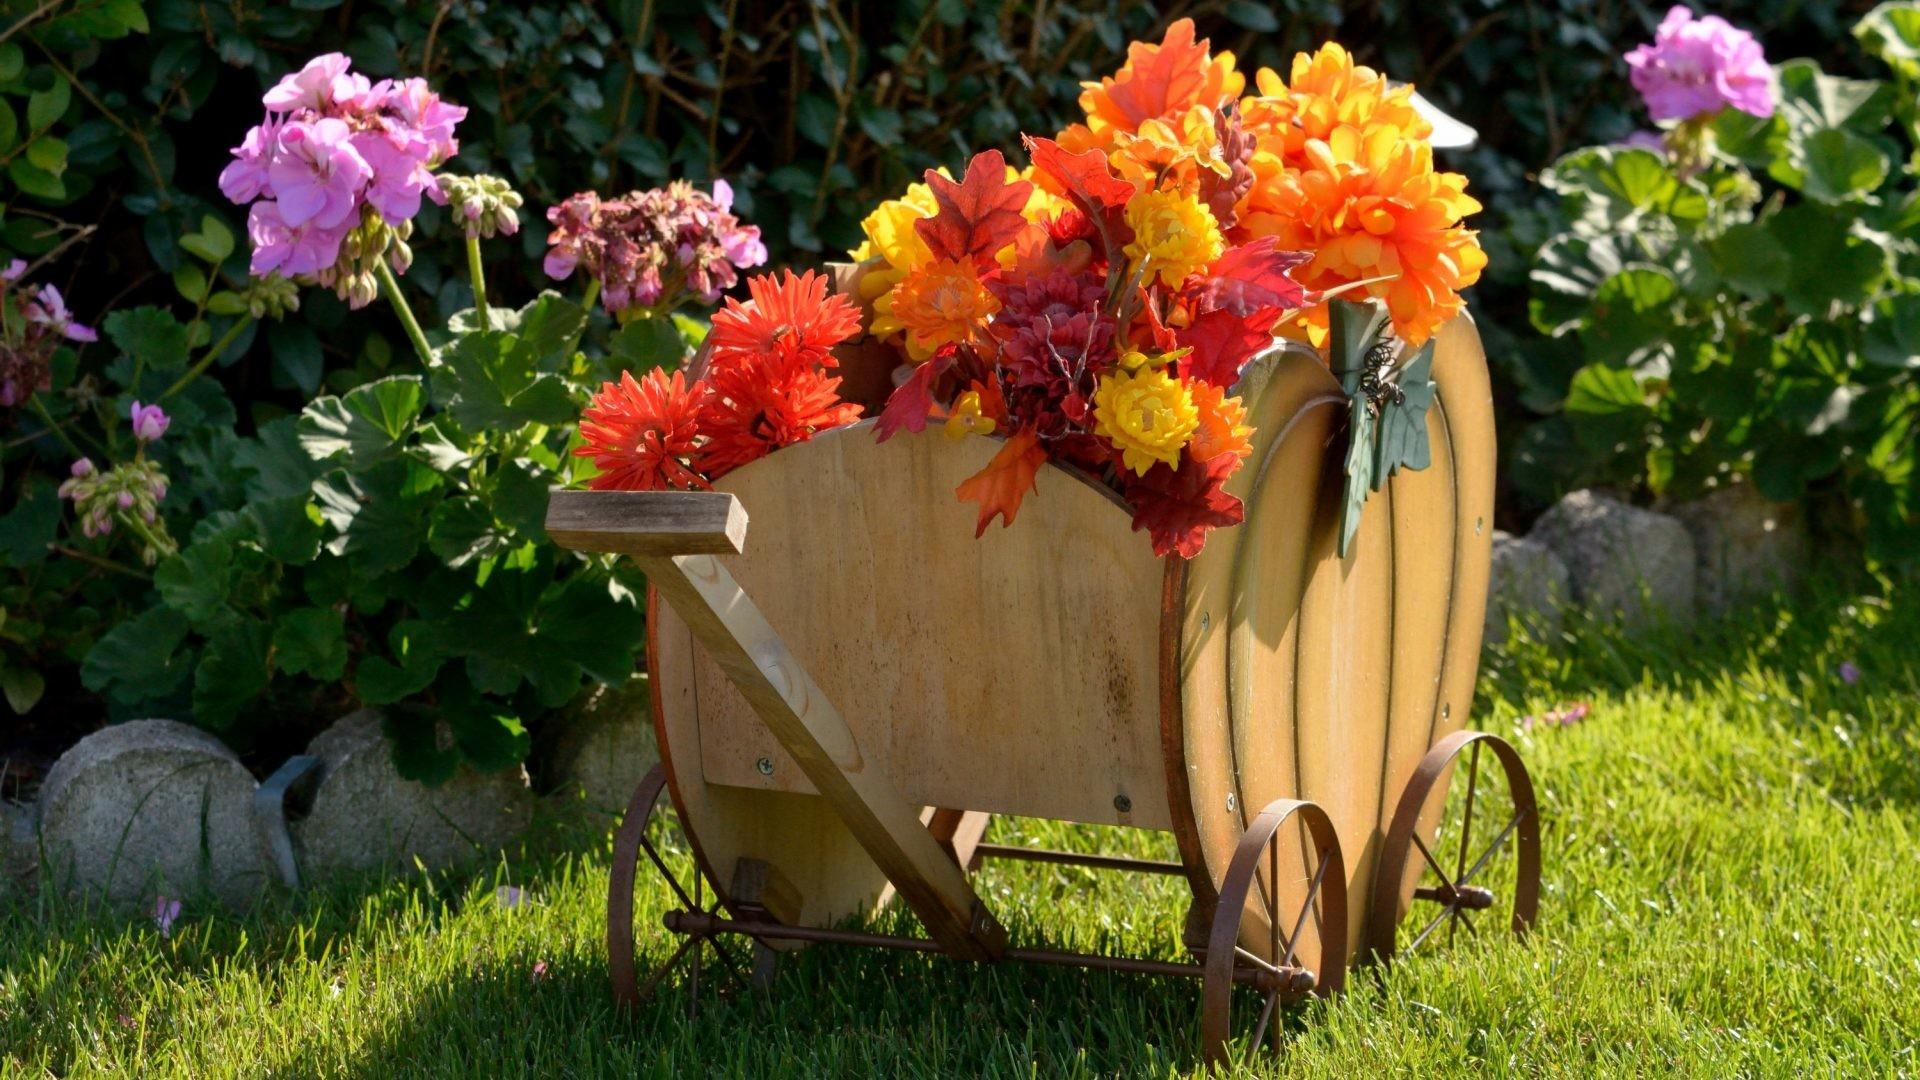 Festive Tag – Festive Wagon Decor Harvest Autumn Flower Scene Desktop  Flowers Backgrounds for HD 16